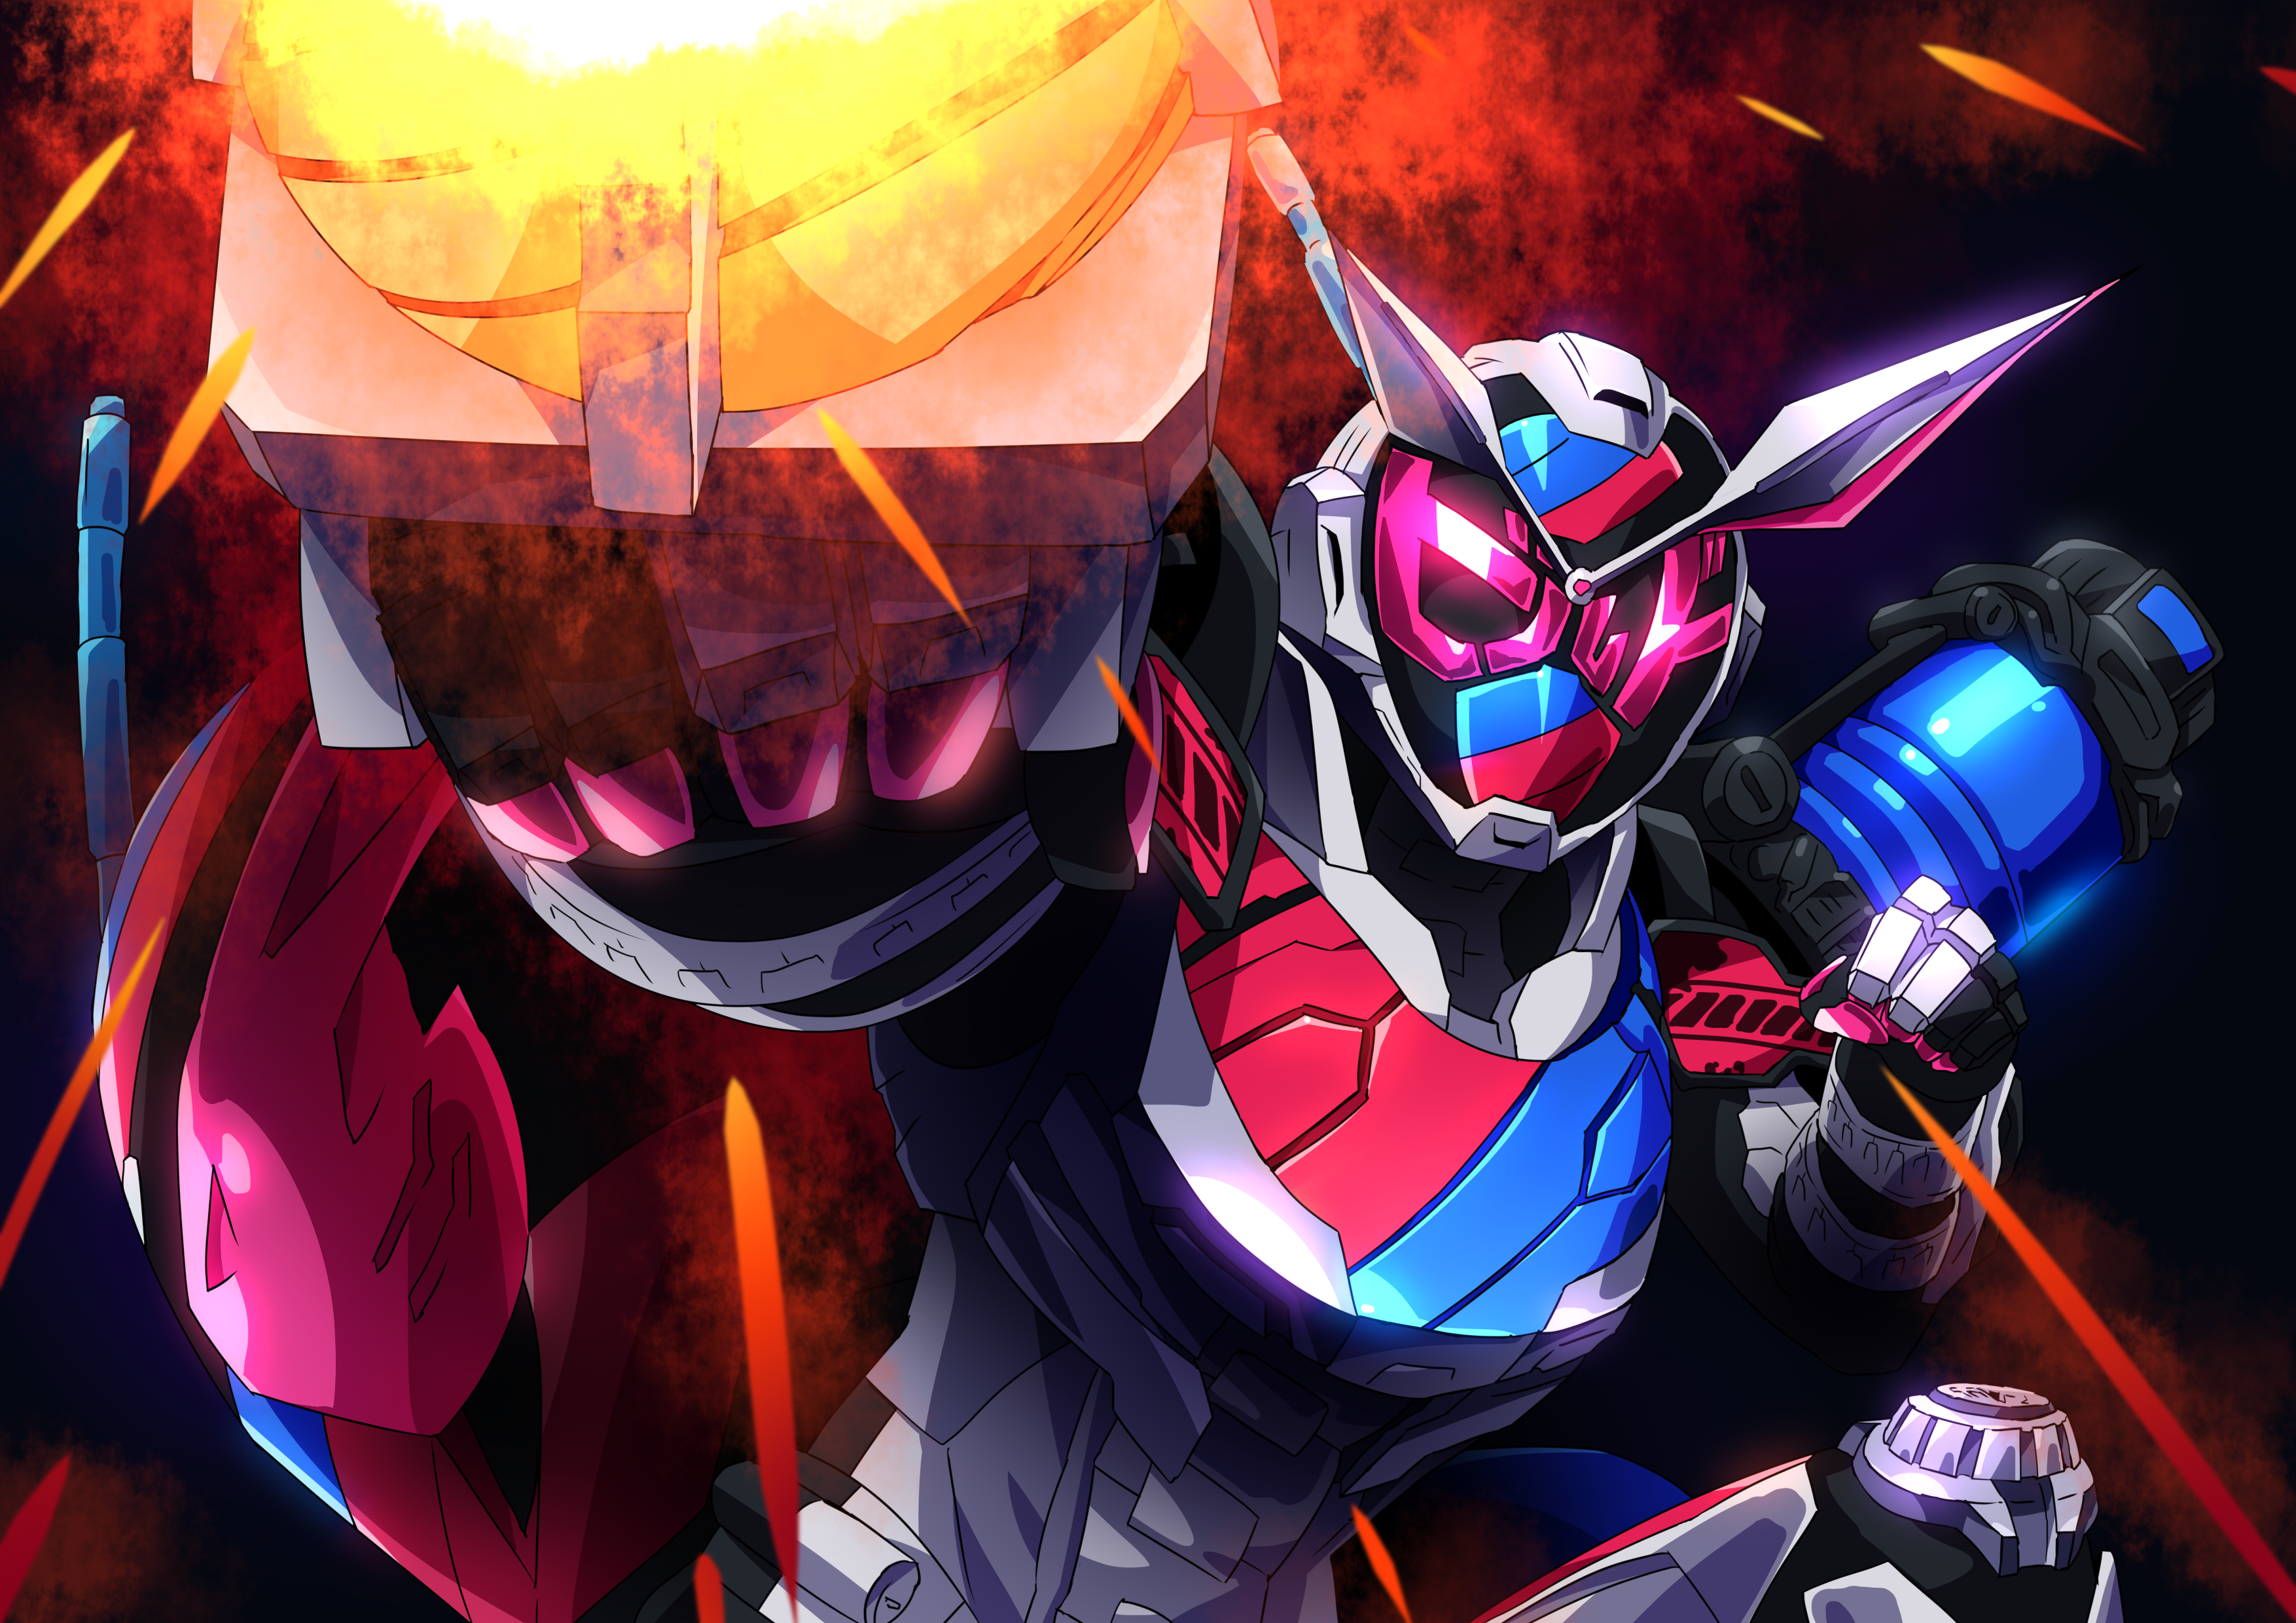 Kamen Rider Zi O Build Armor Kamen Rider Kamen Rider Kamen